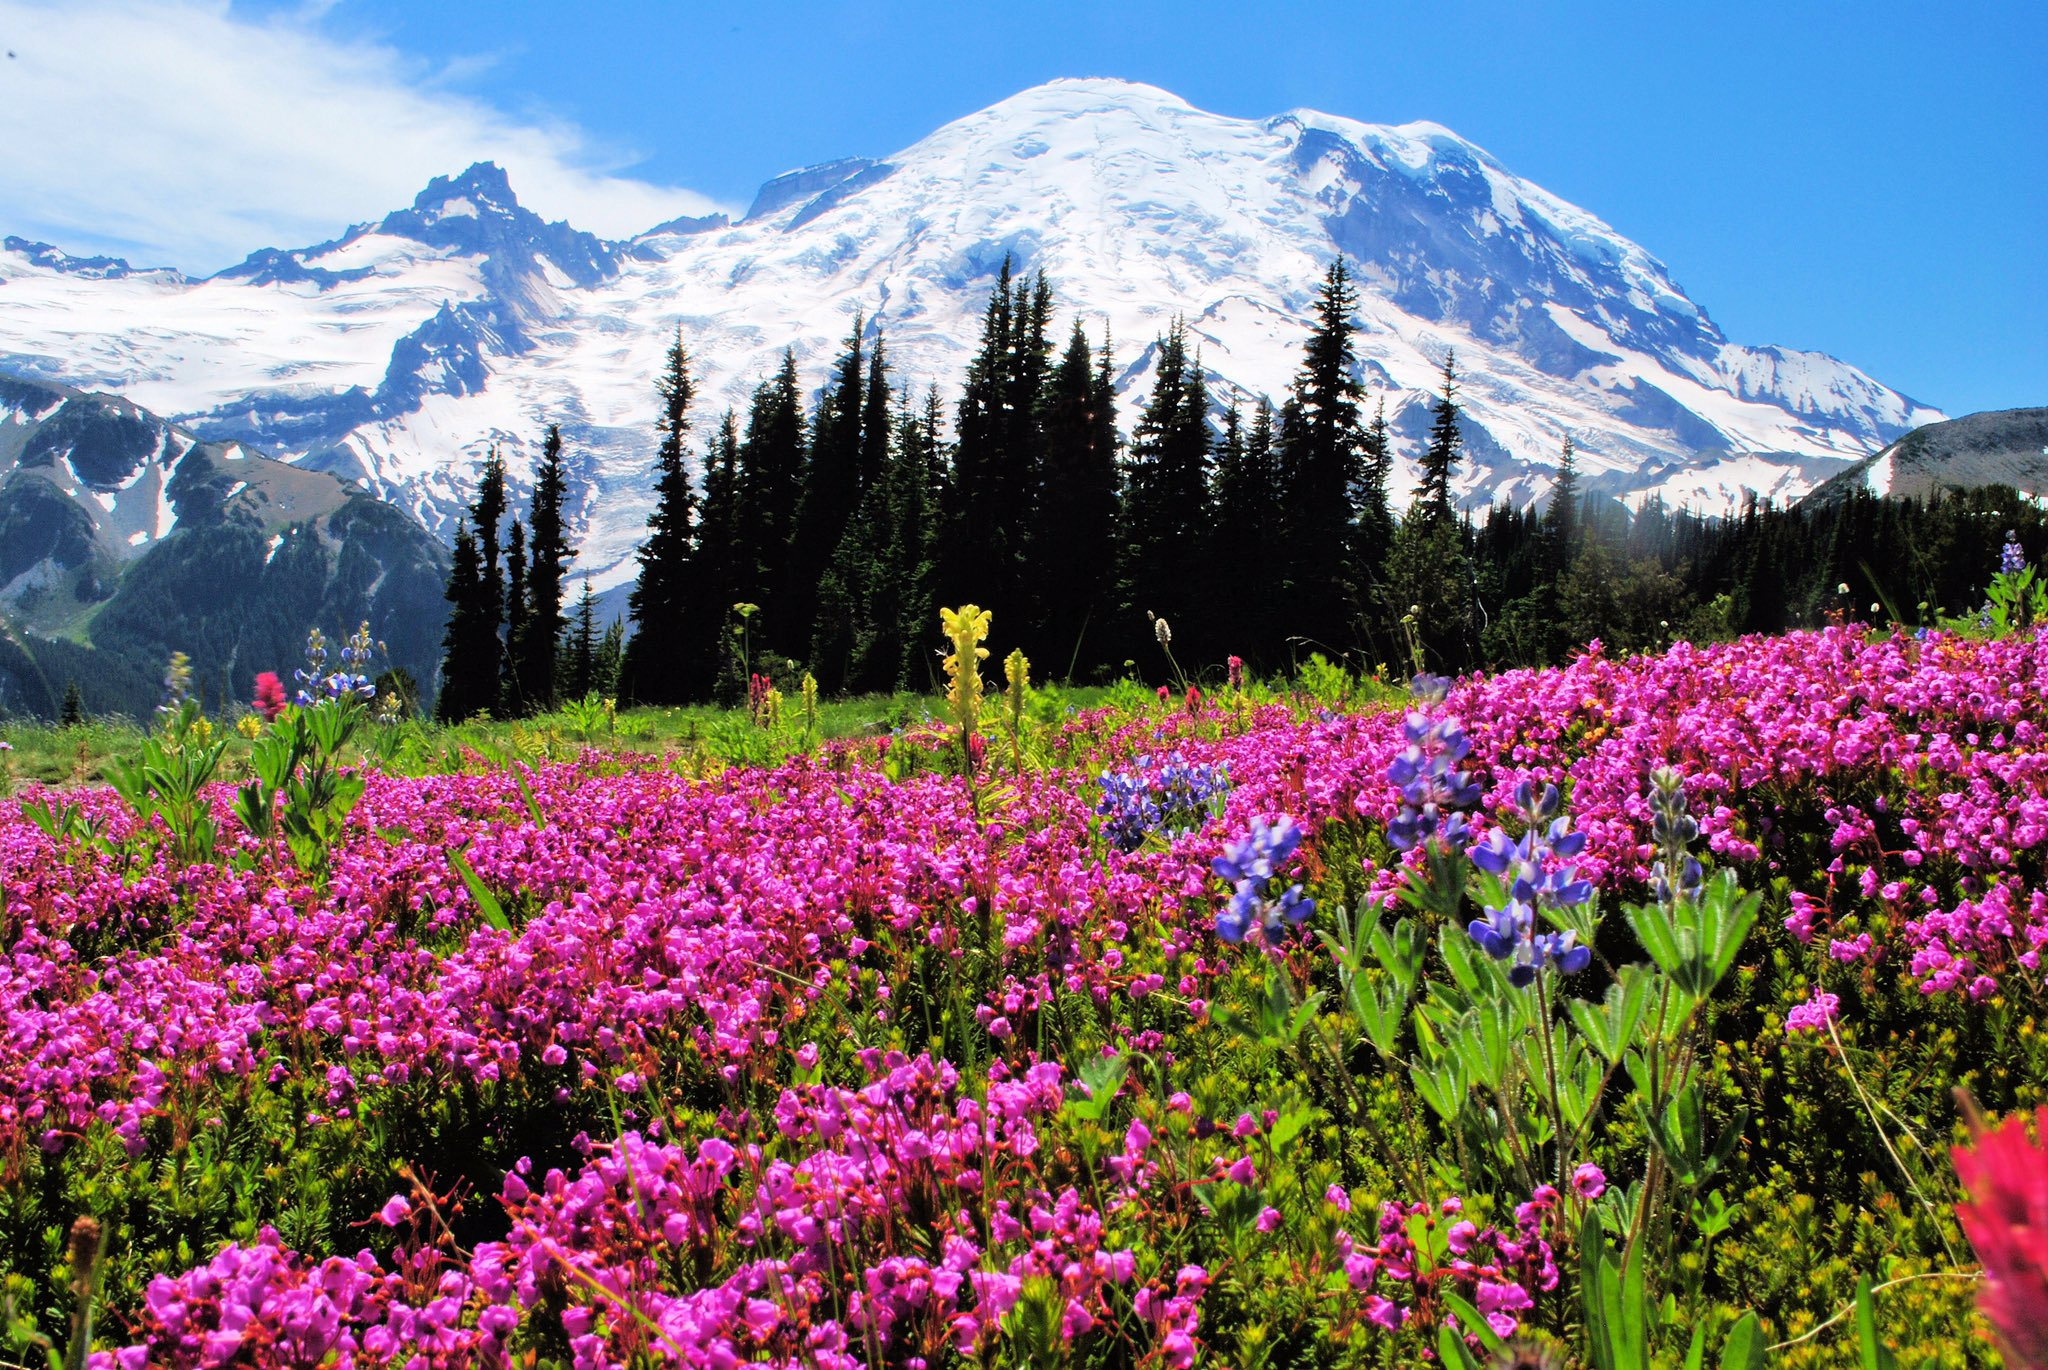 Spring Wildflowers Of The Mid Atlantic Region Movie HD free download 720p